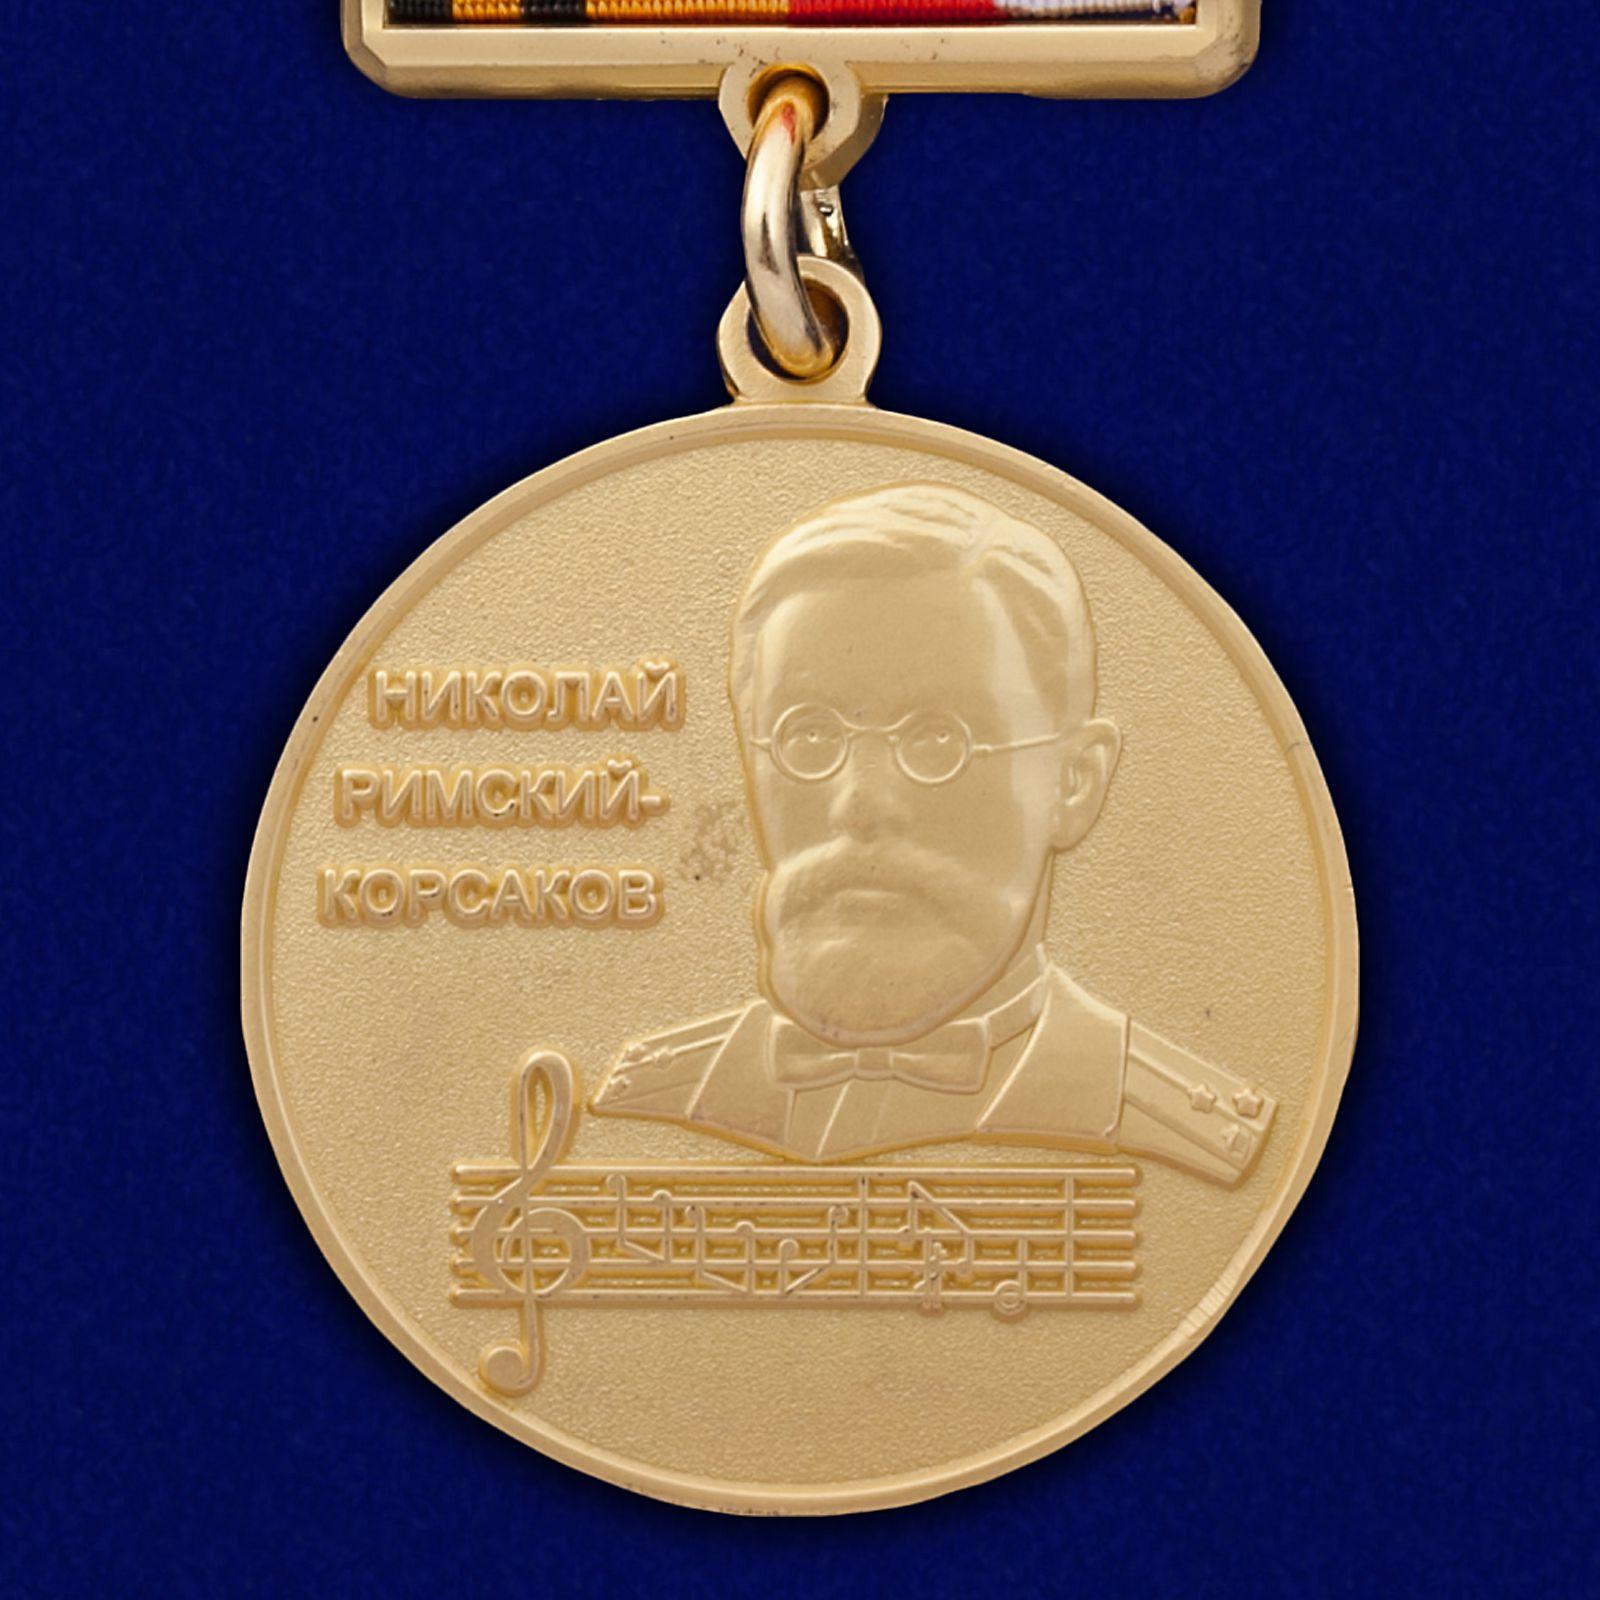 Знак Николай Римский-Корсаков МО России